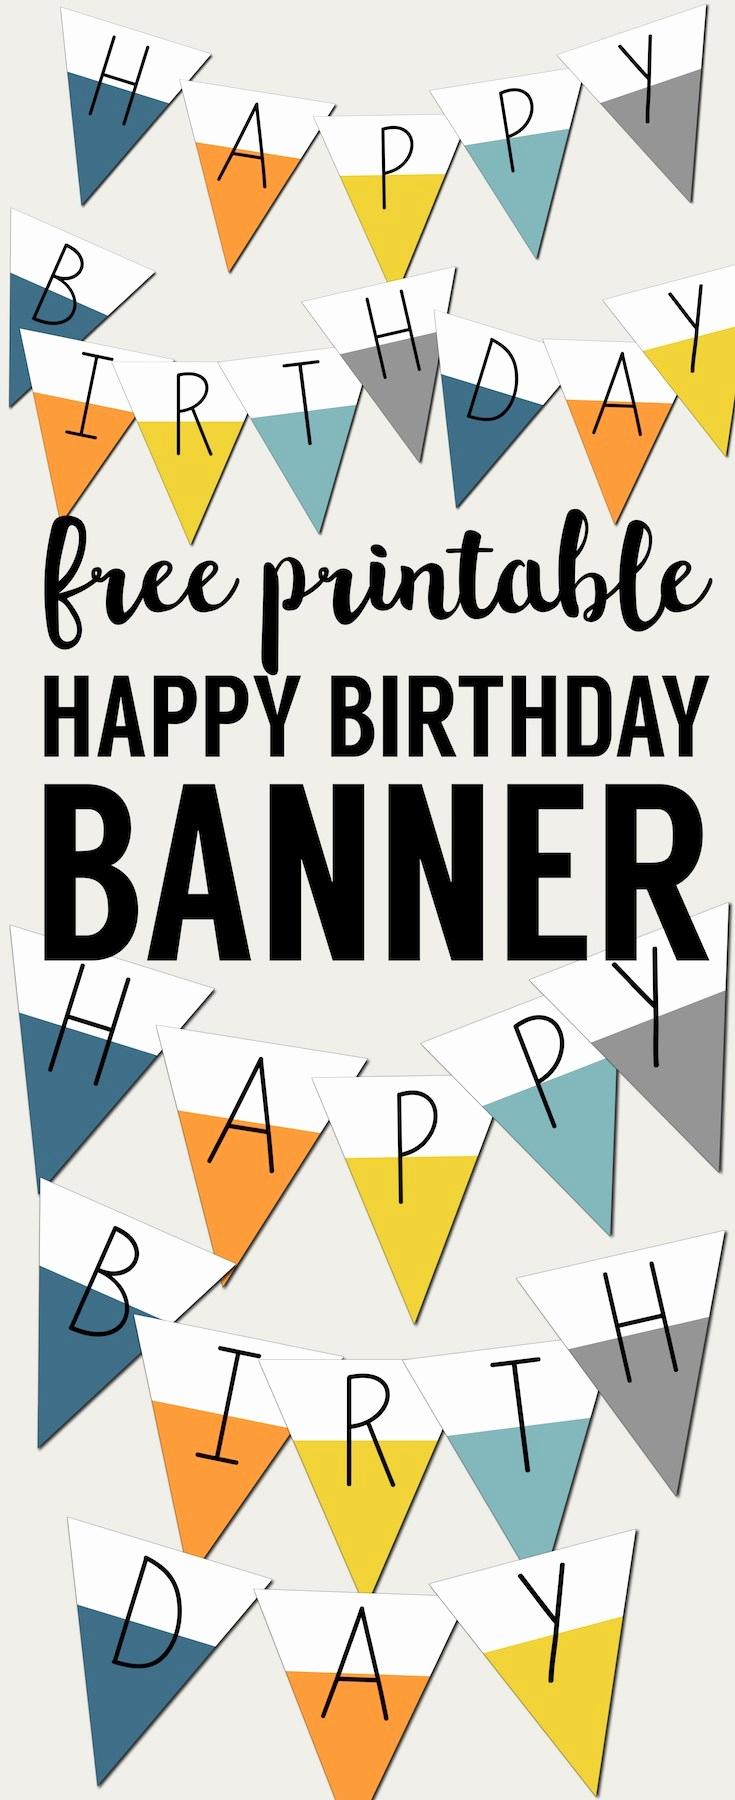 Printable Happy Birthday Banners New Free Printable Happy Birthday Banner Paper Trail Design